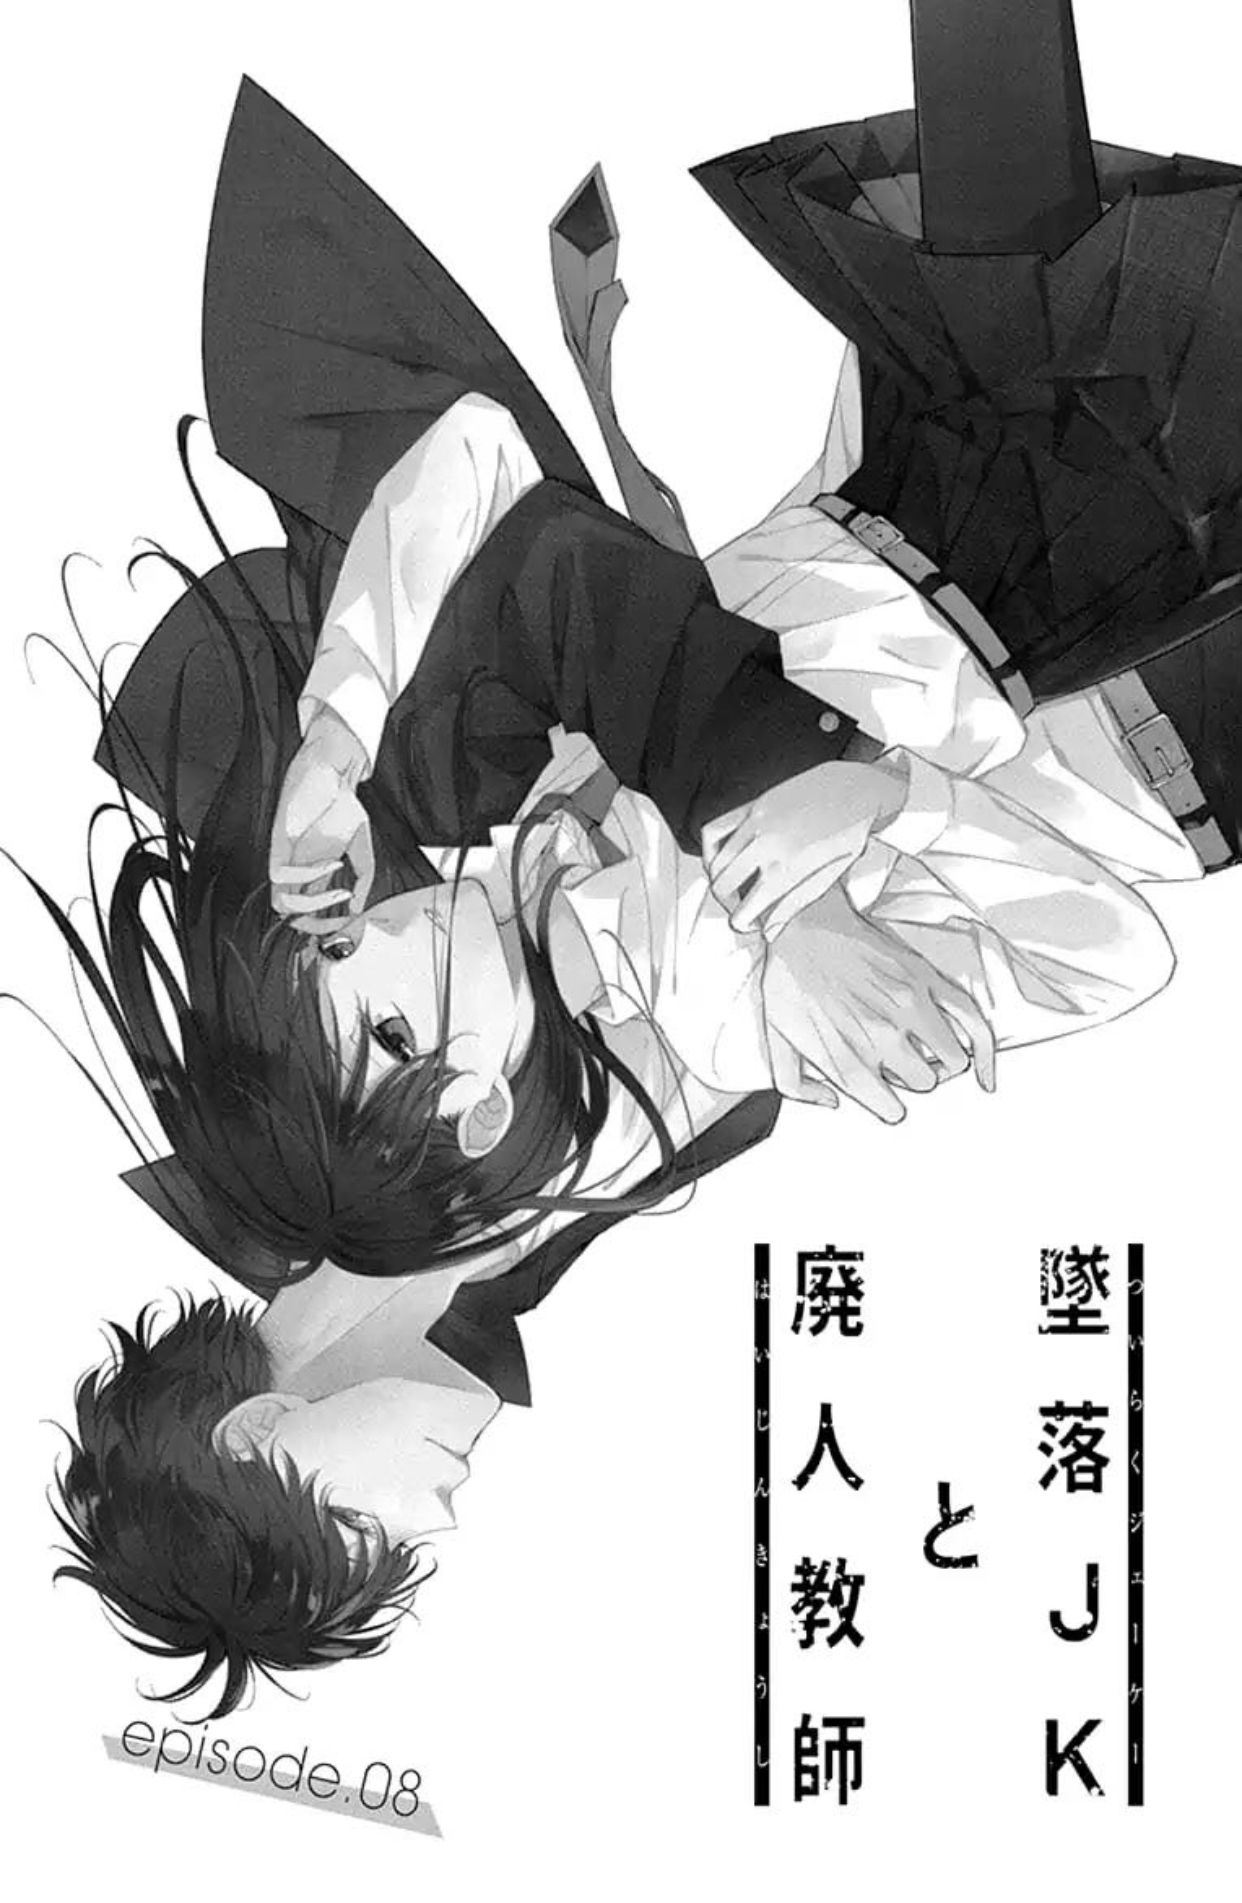 Pin by Animemangaluver on Tsuiraku JK to Haijin Kyoushi